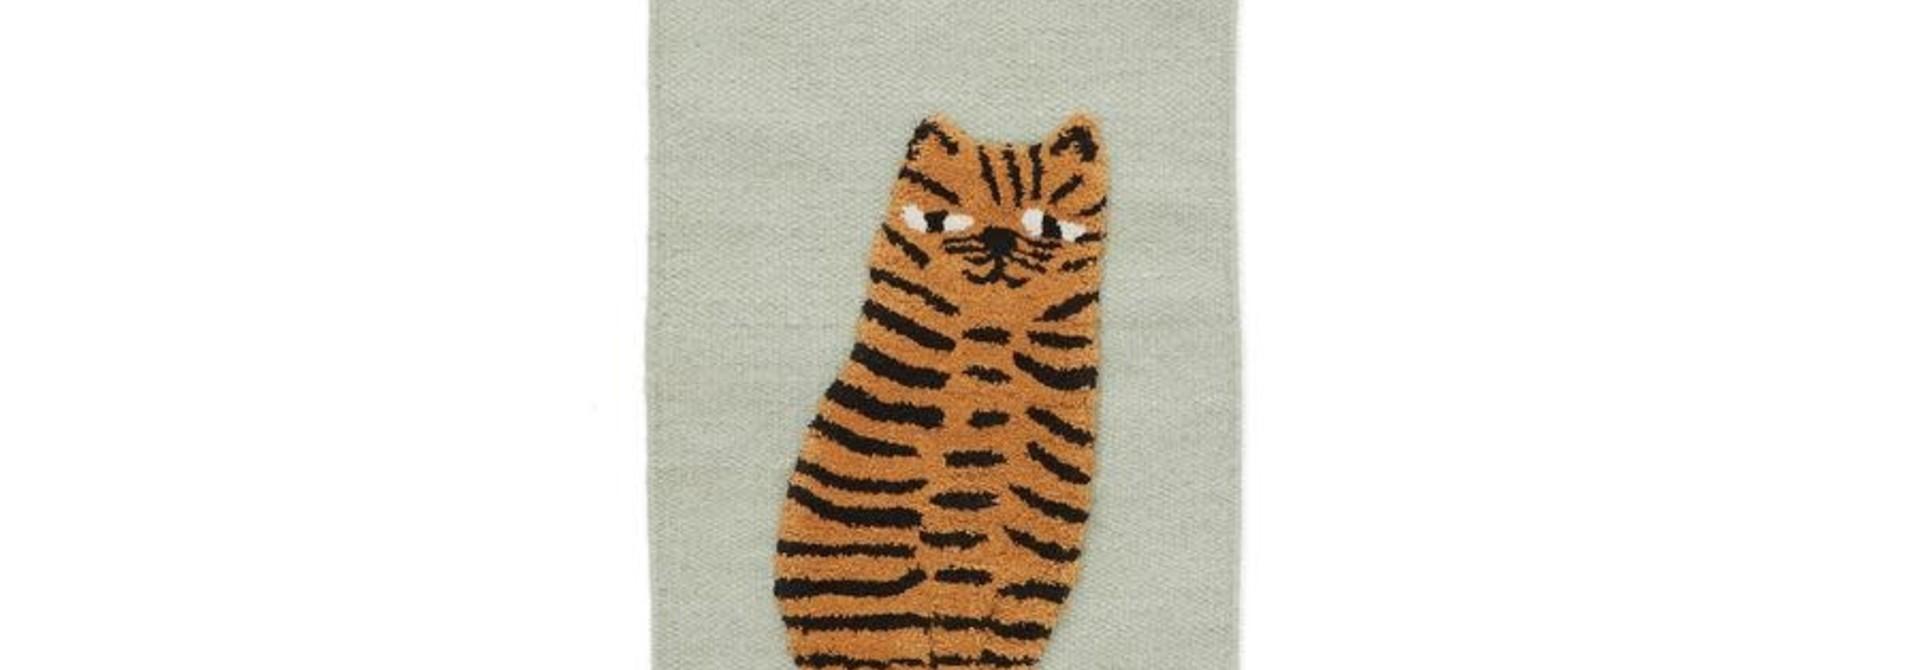 Tiger Wallhanger